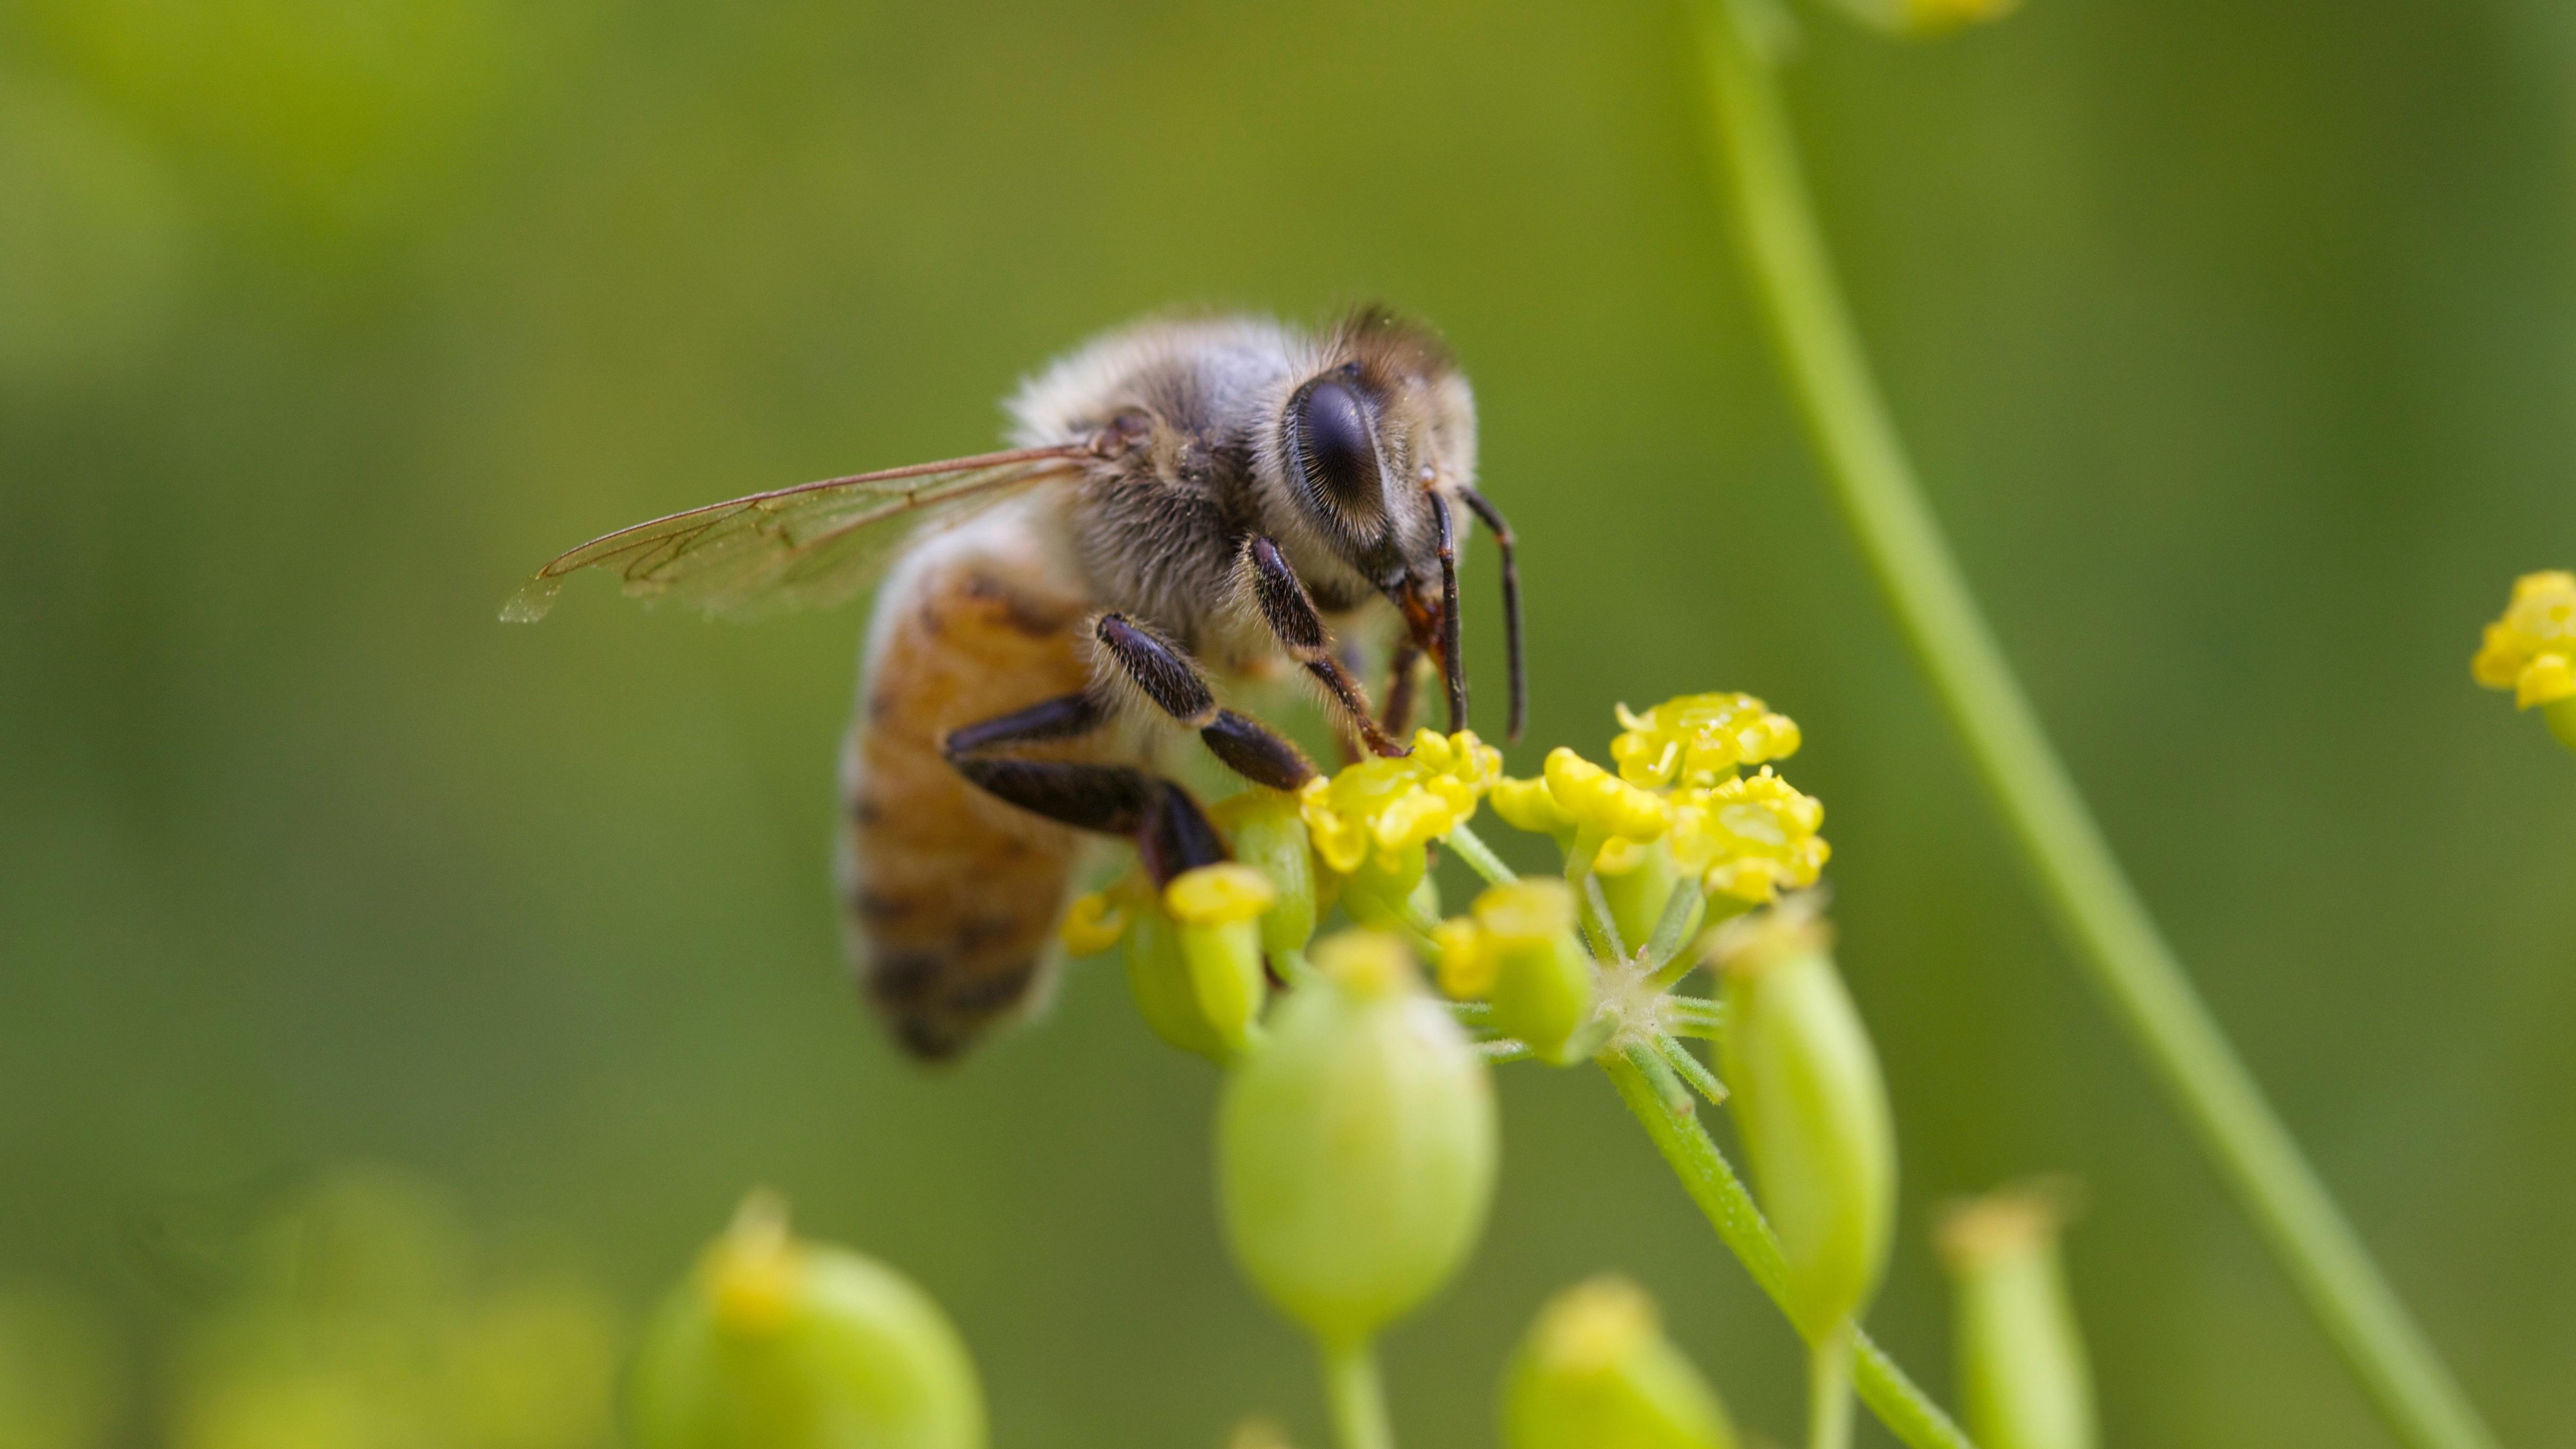 Collateral Damage: Bees die in South Carolina Zika spraying